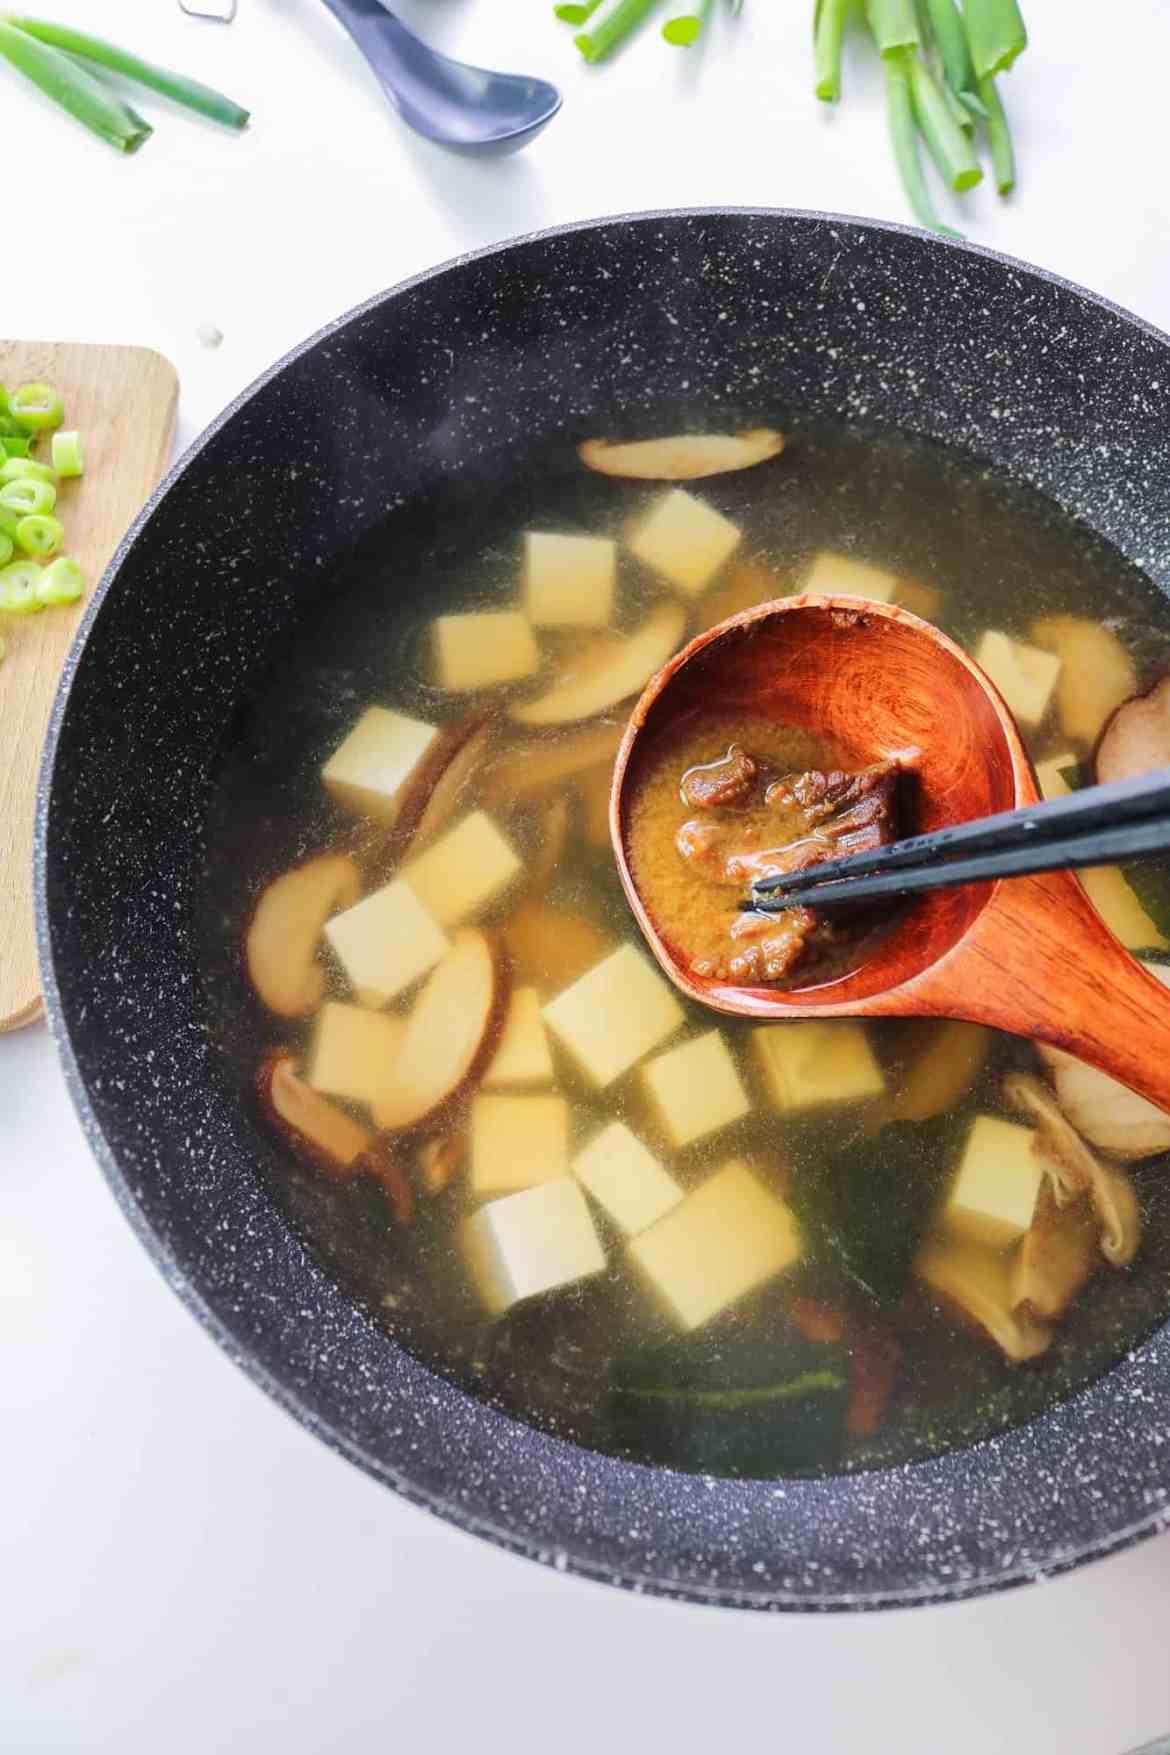 dissolving white miso paste in dashi broth